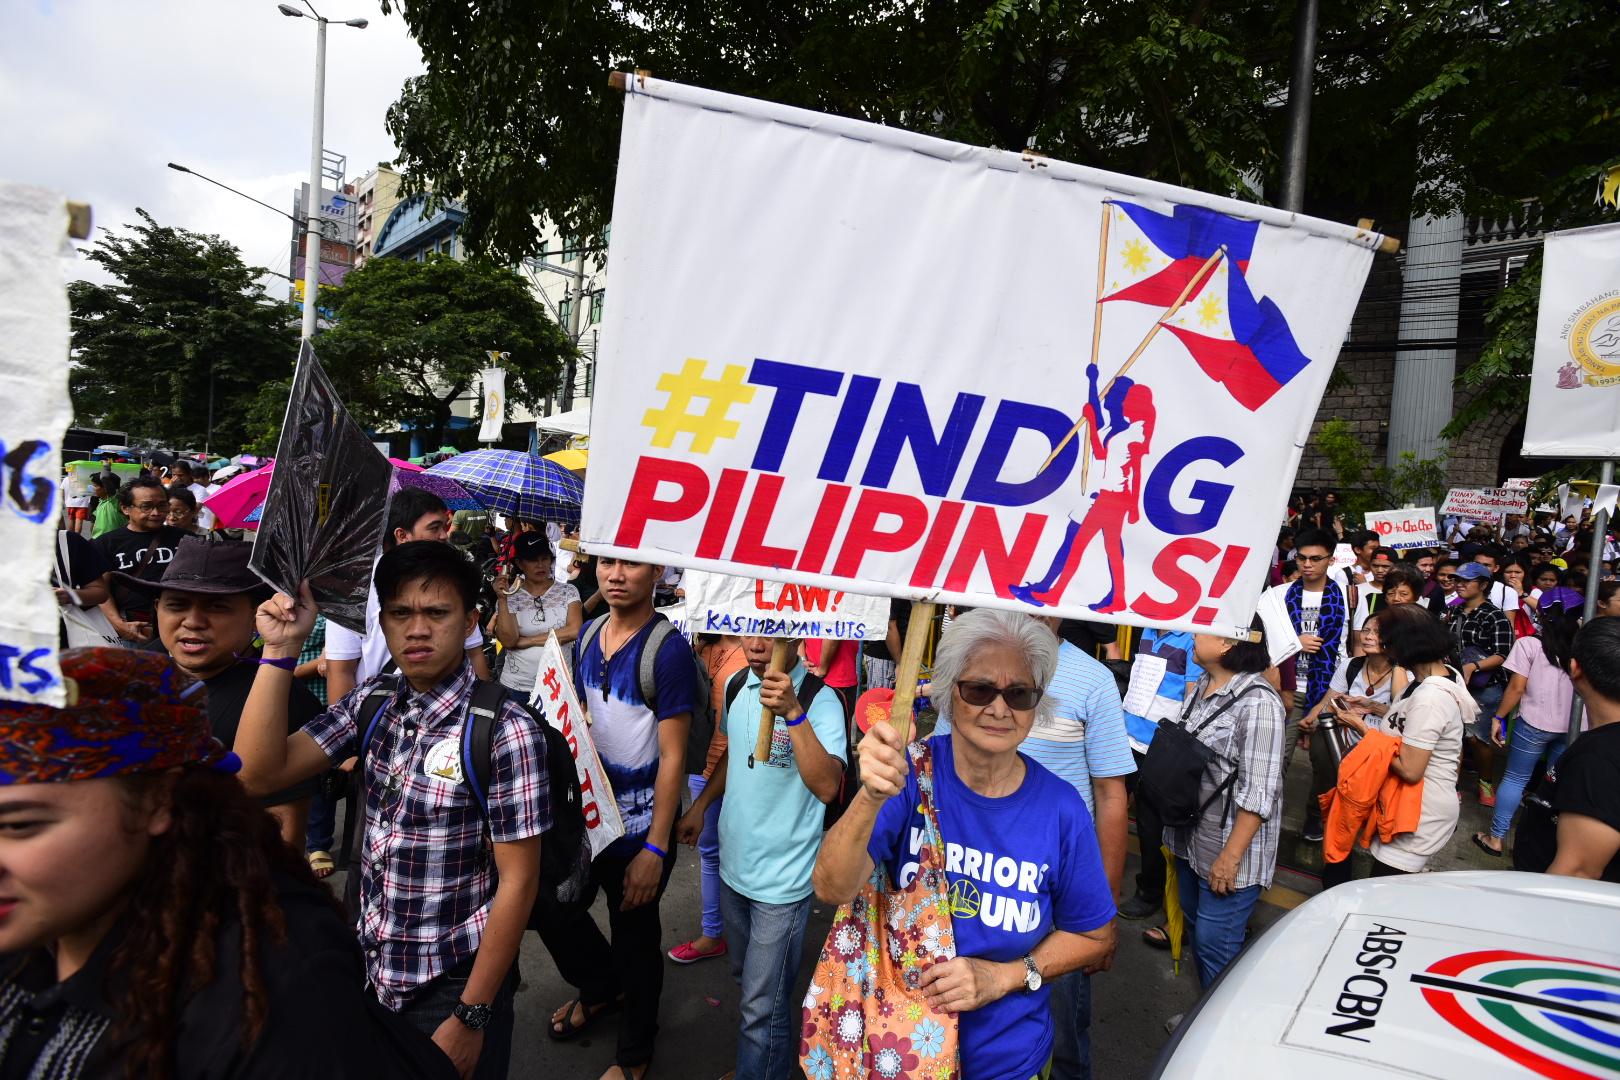 TINDIG PILIPINAS. Former social welfare secretary Corazon Soliman of Tindig Pilipinas dubs Duterte's State of the Nation Address as 'SONA de bola.' Photo by Maria Tan/Rappler